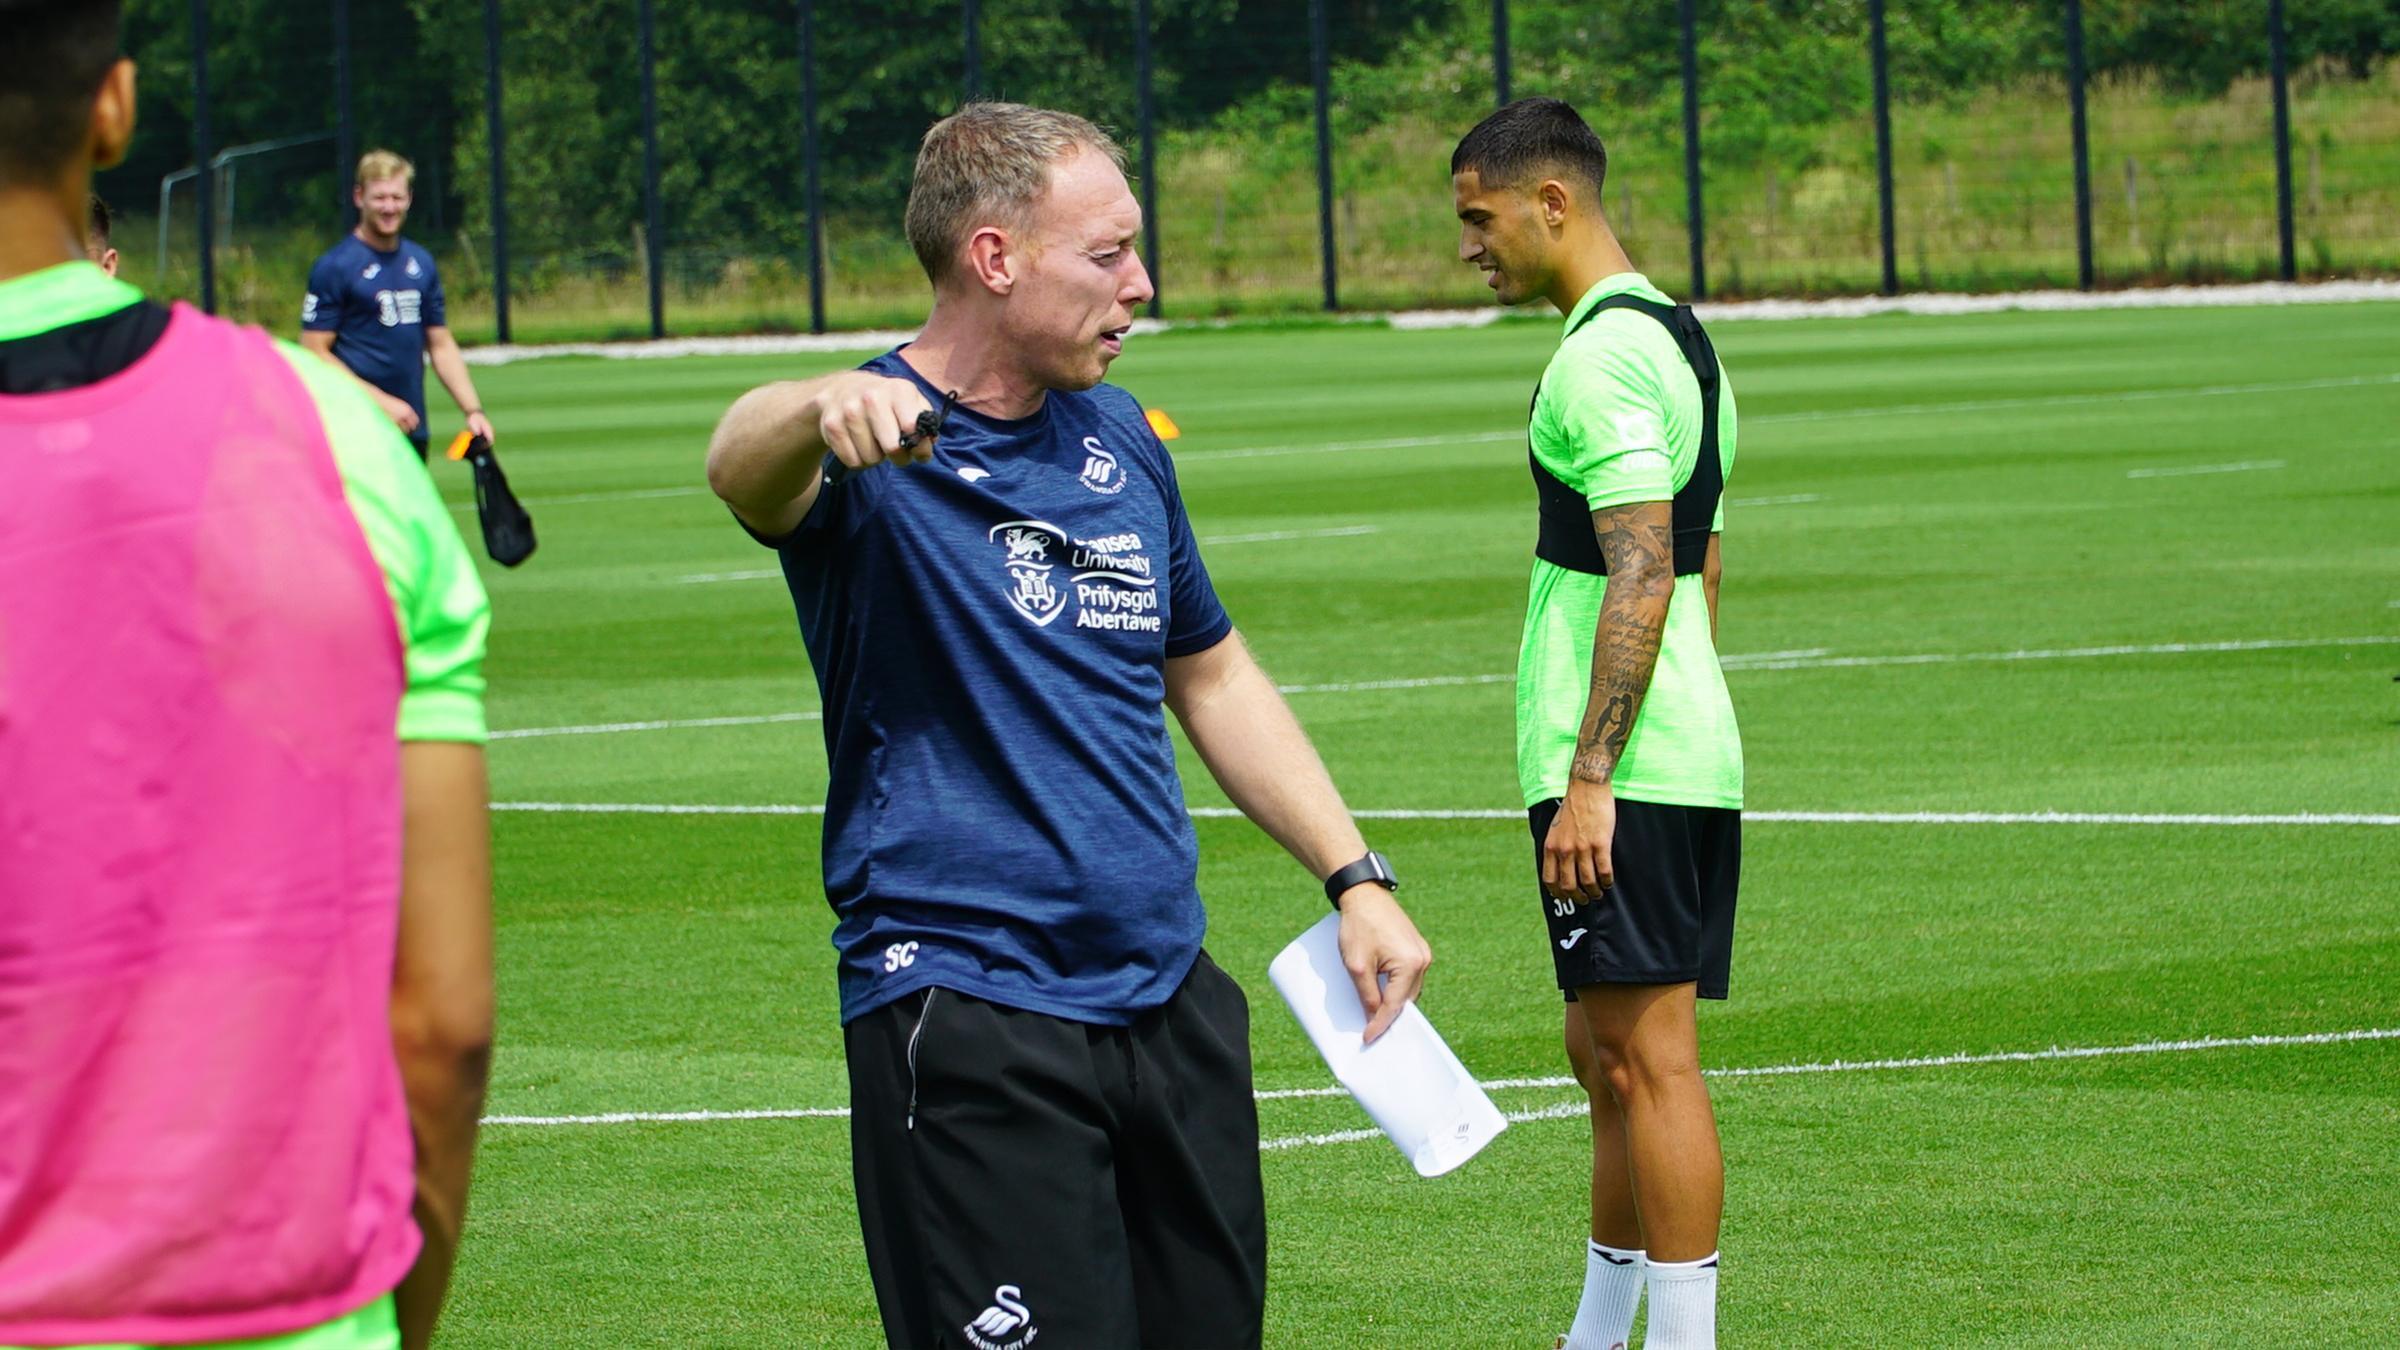 Swans head coach Steve Cooper